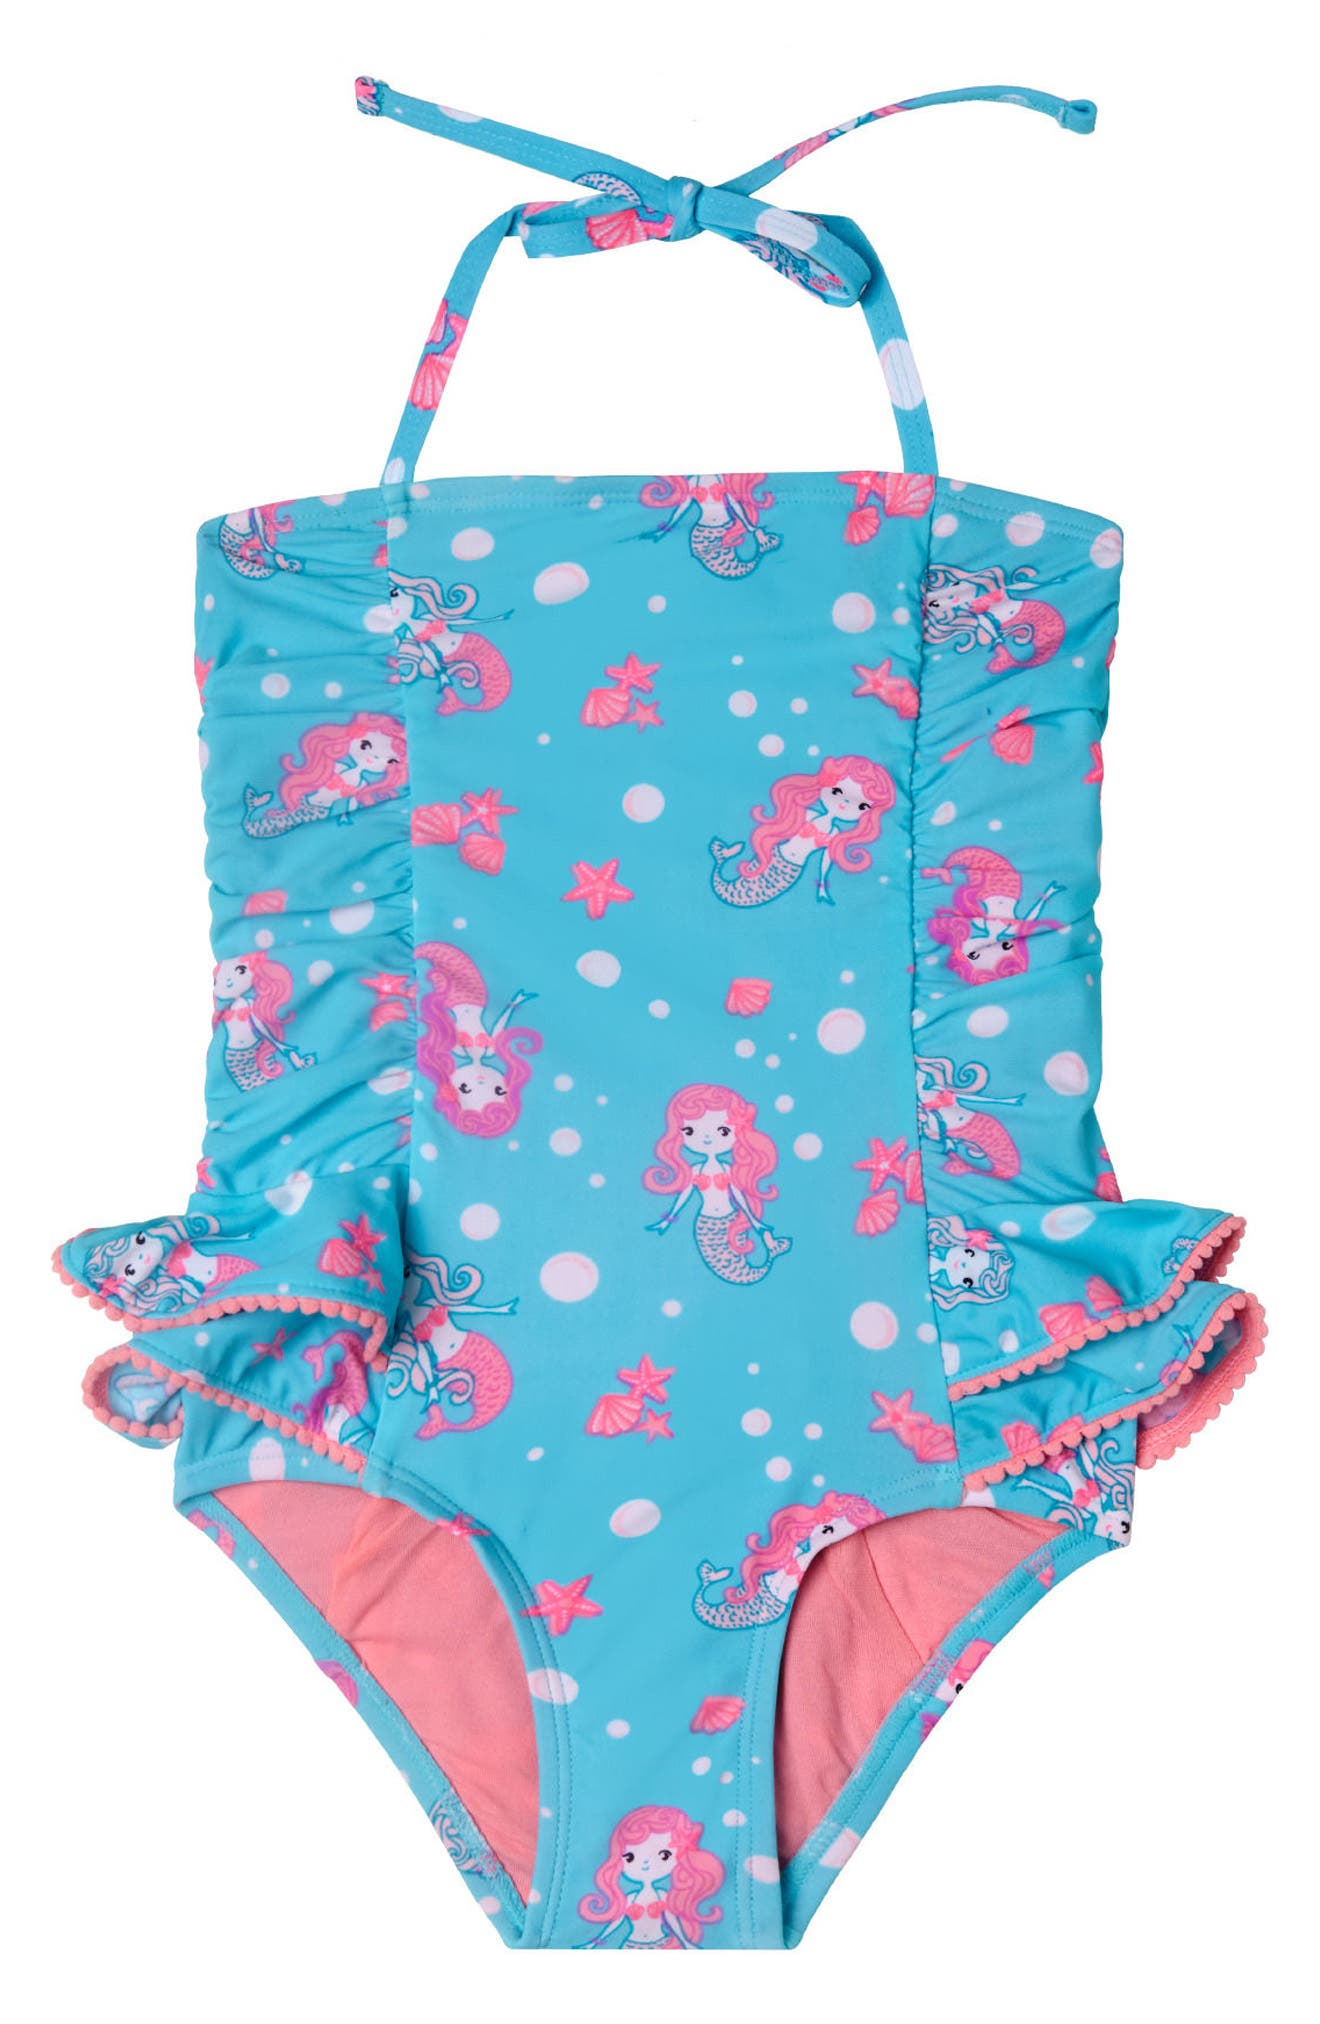 Main Image - Hula Star Mermaid Crush One-Piece Swimsuit (Toddler Girls & Little Girls)